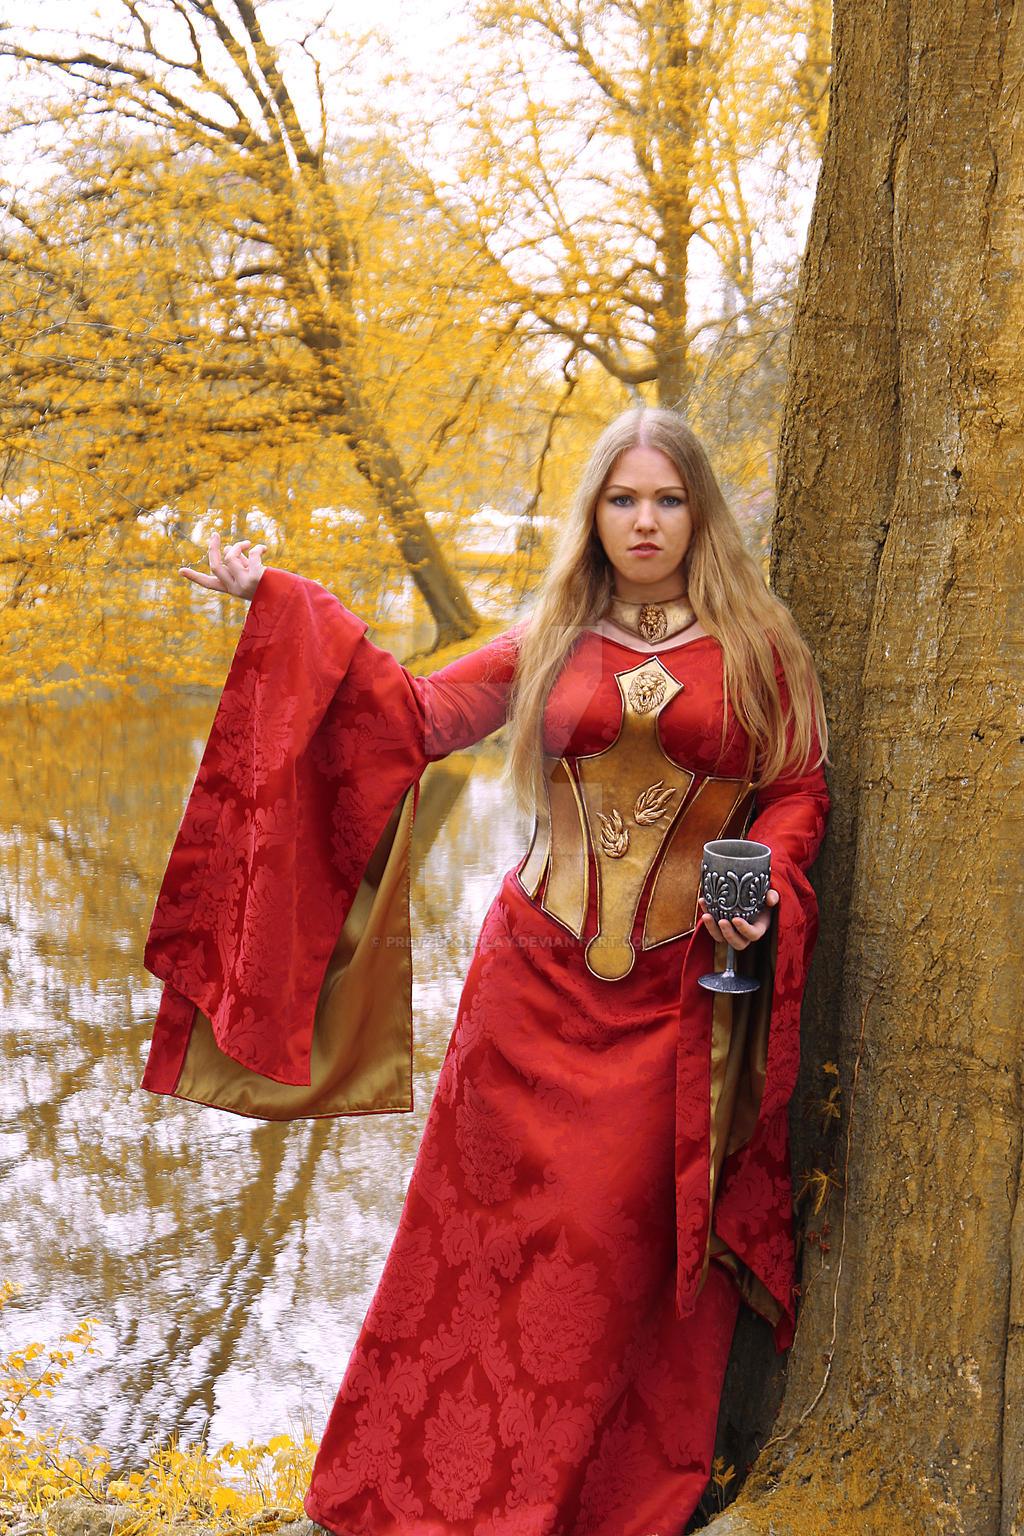 Cersei Lannister cosplay by PretzlCosplay